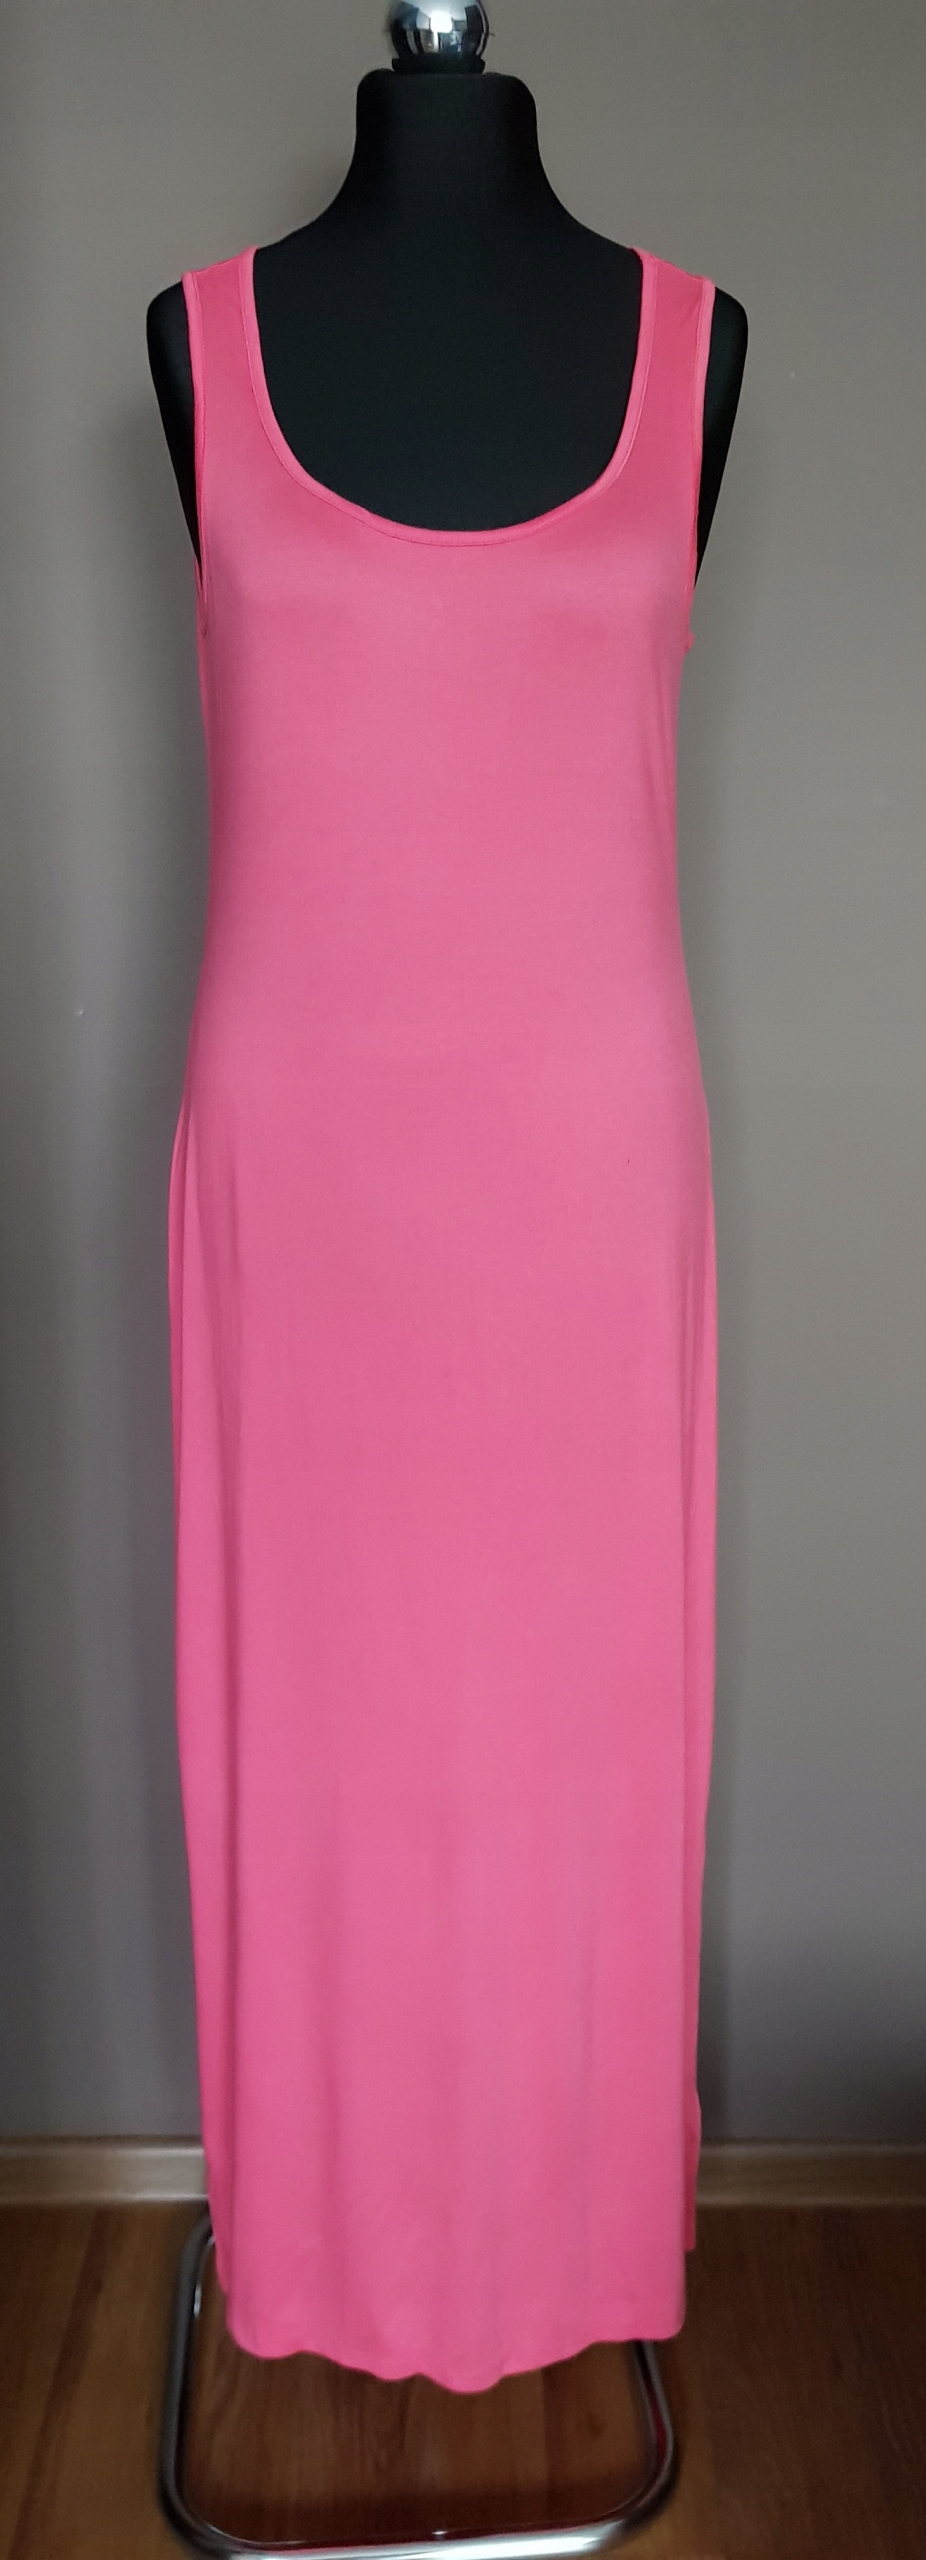 ATMOSPHERE sukienka długa maxi malinowa różowa 44